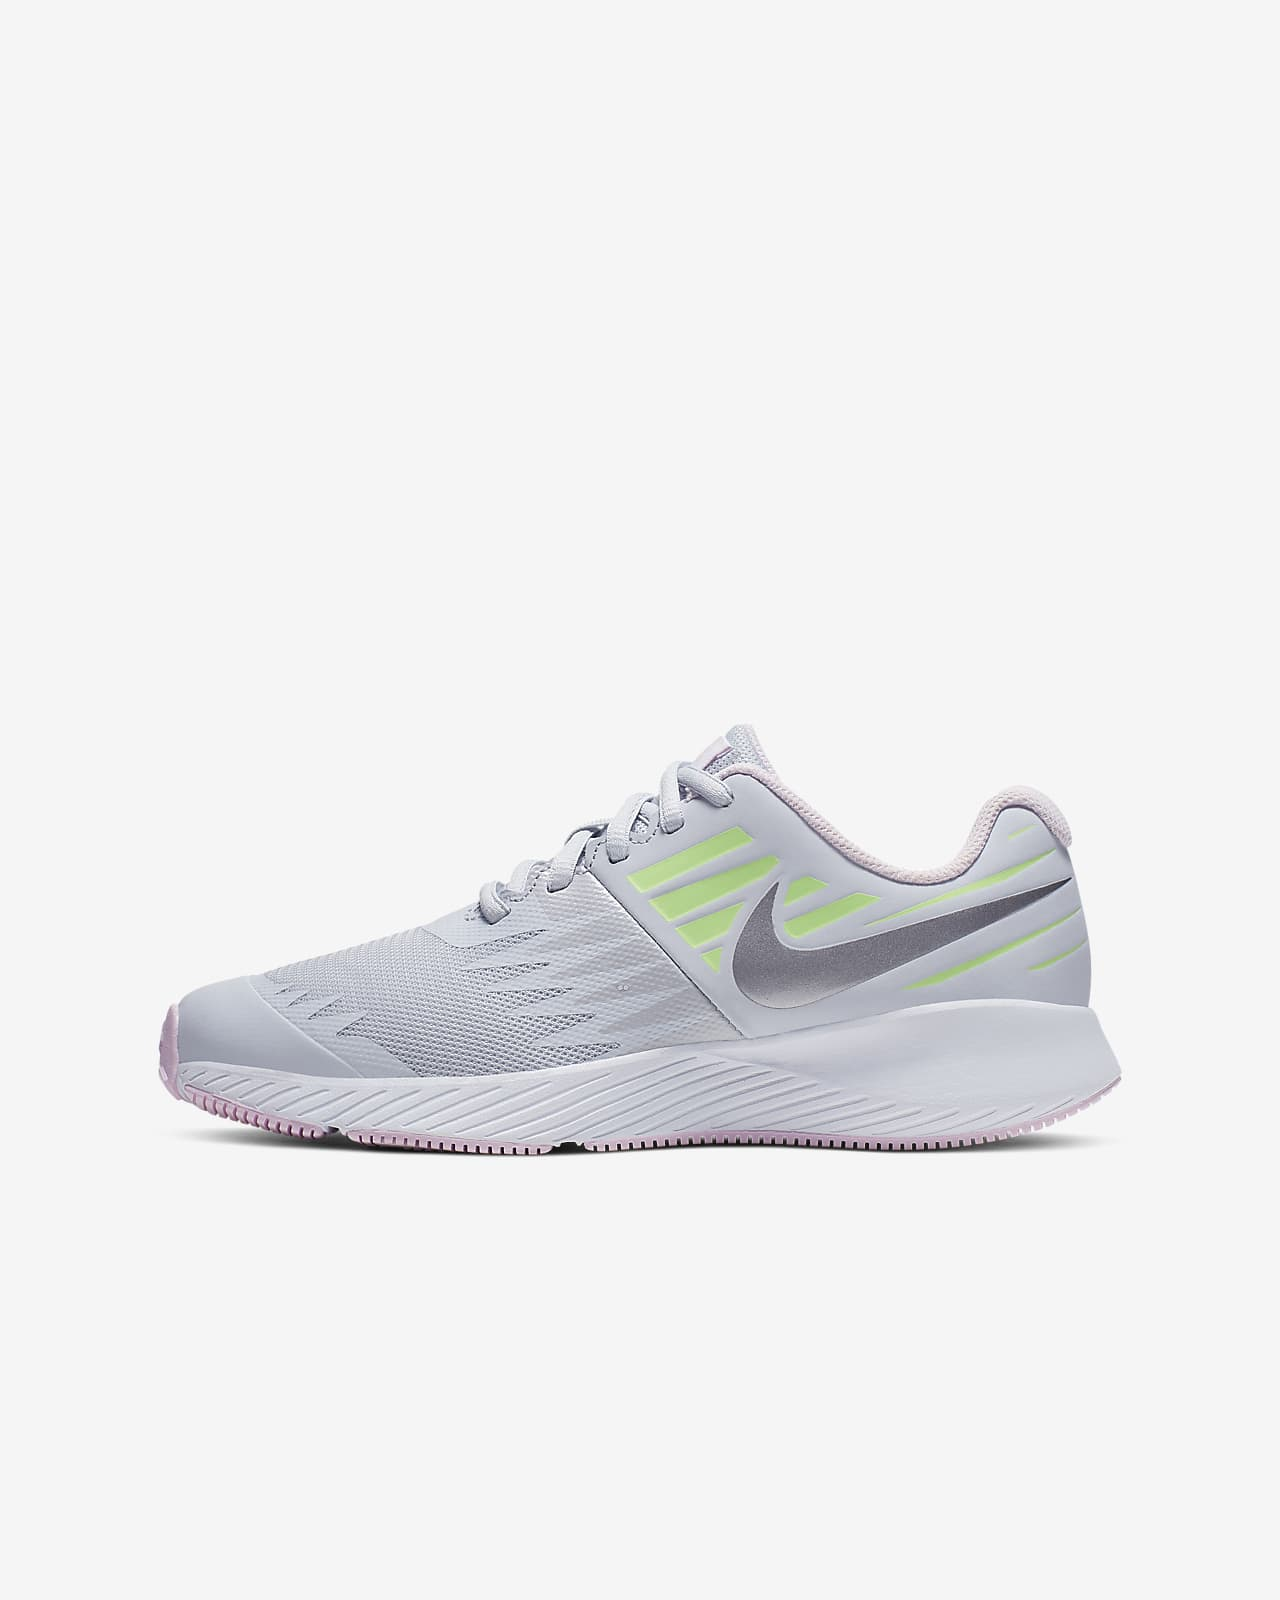 Algebraico Cap Raza humana  Nike Star Runner Zapatillas de running - Niño/a. Nike ES